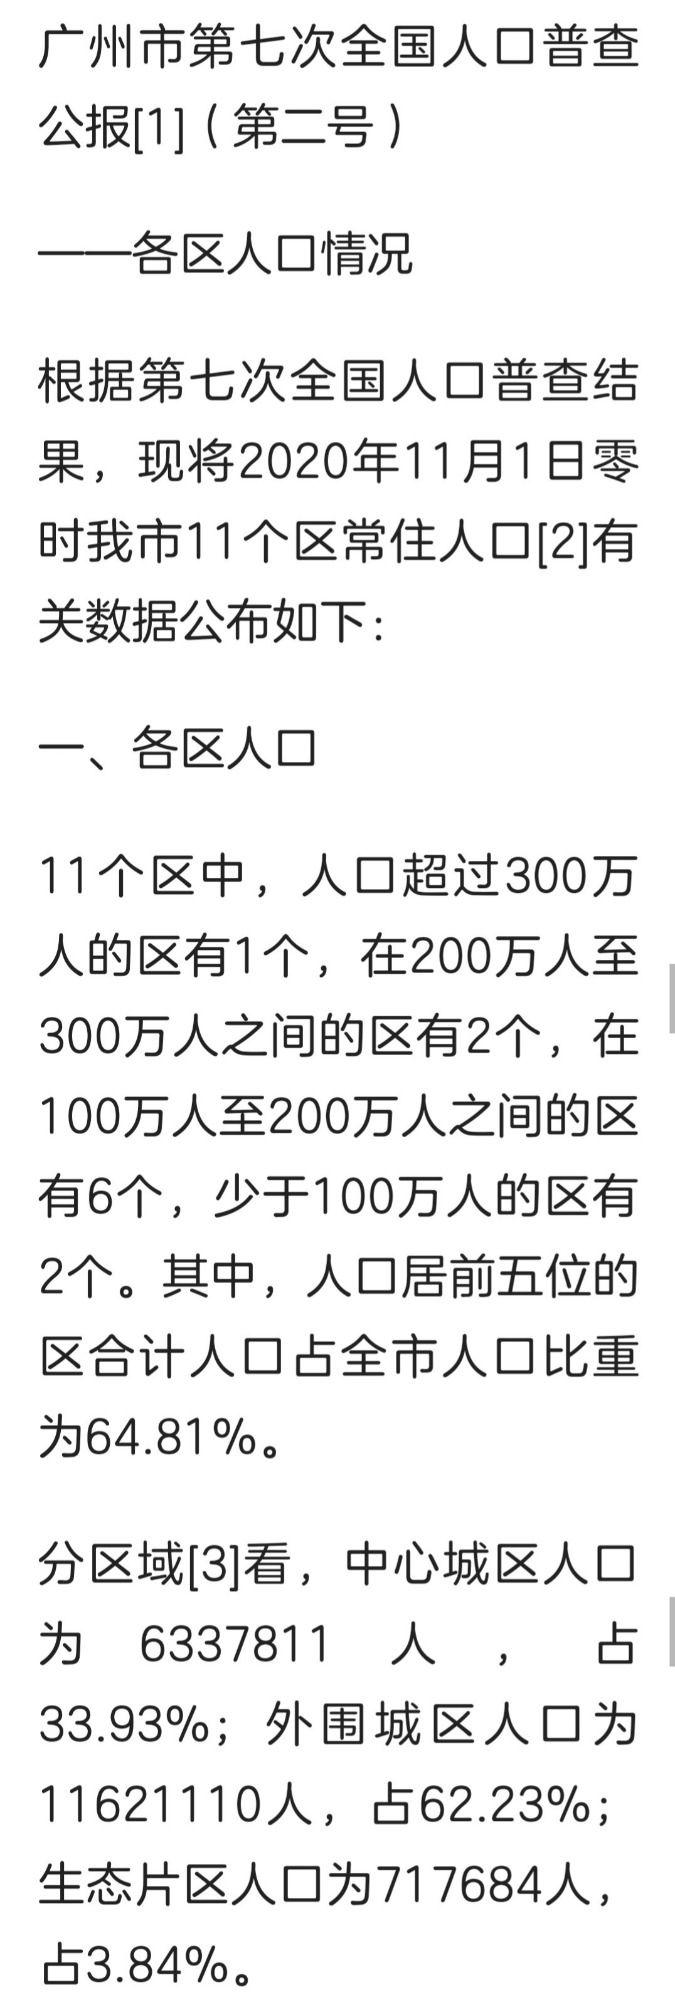 IMG_20210526_212148.jpg